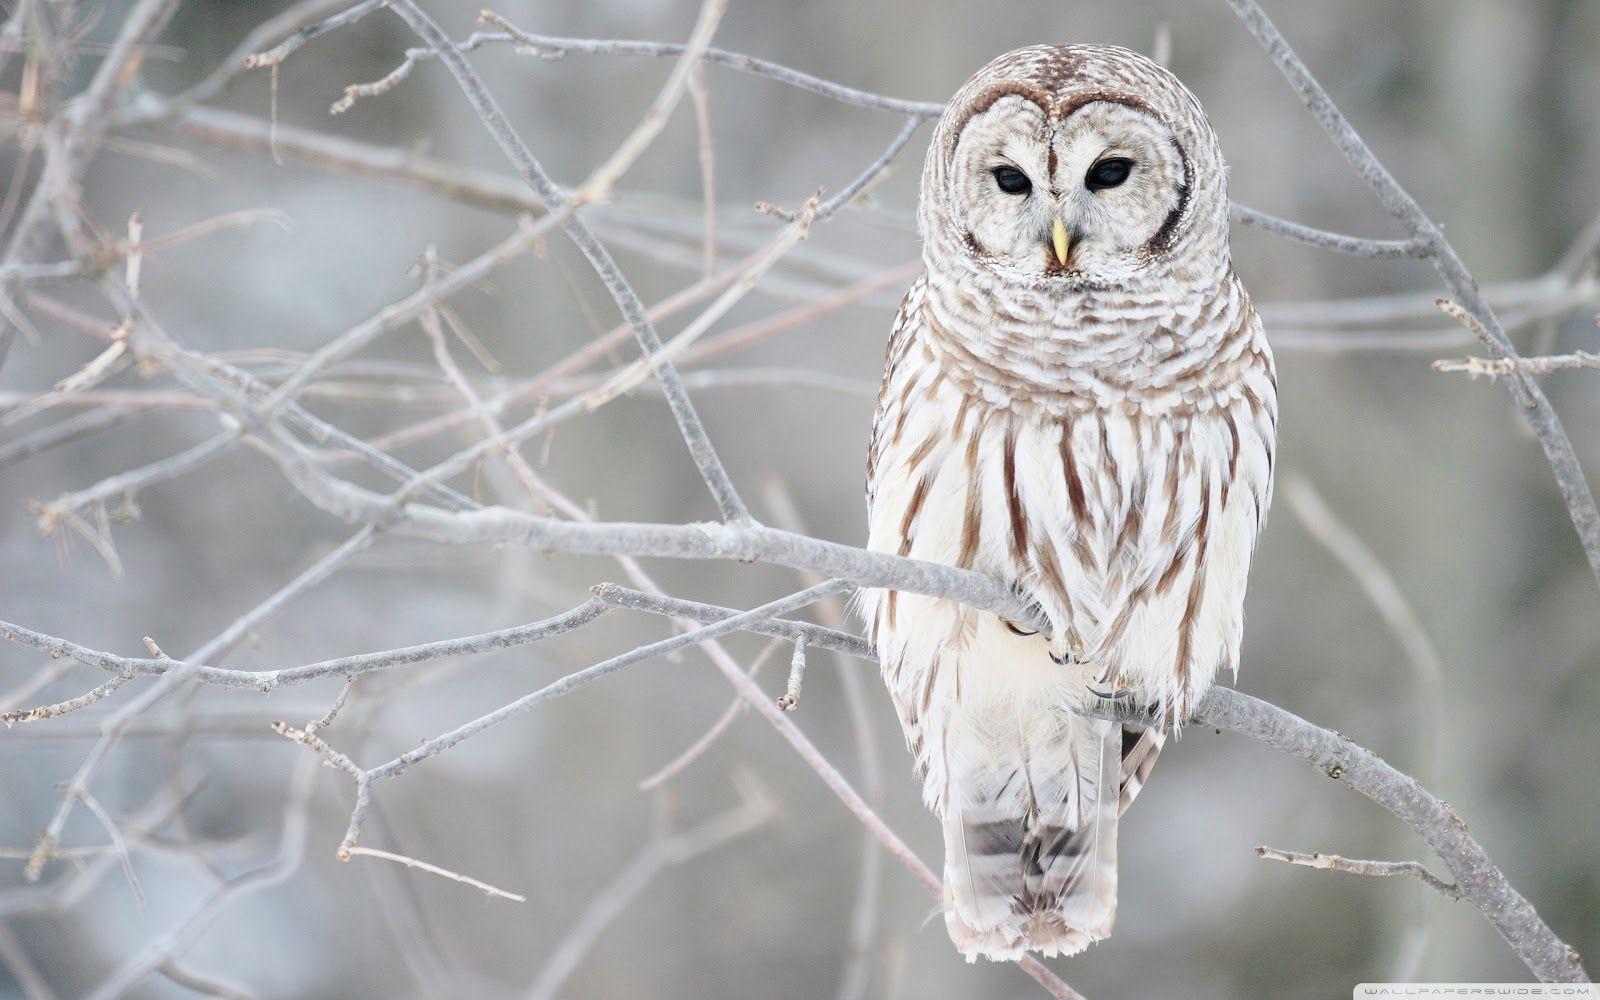 corujas das neves - Pesquisa do Google | Imagens da corujas ...